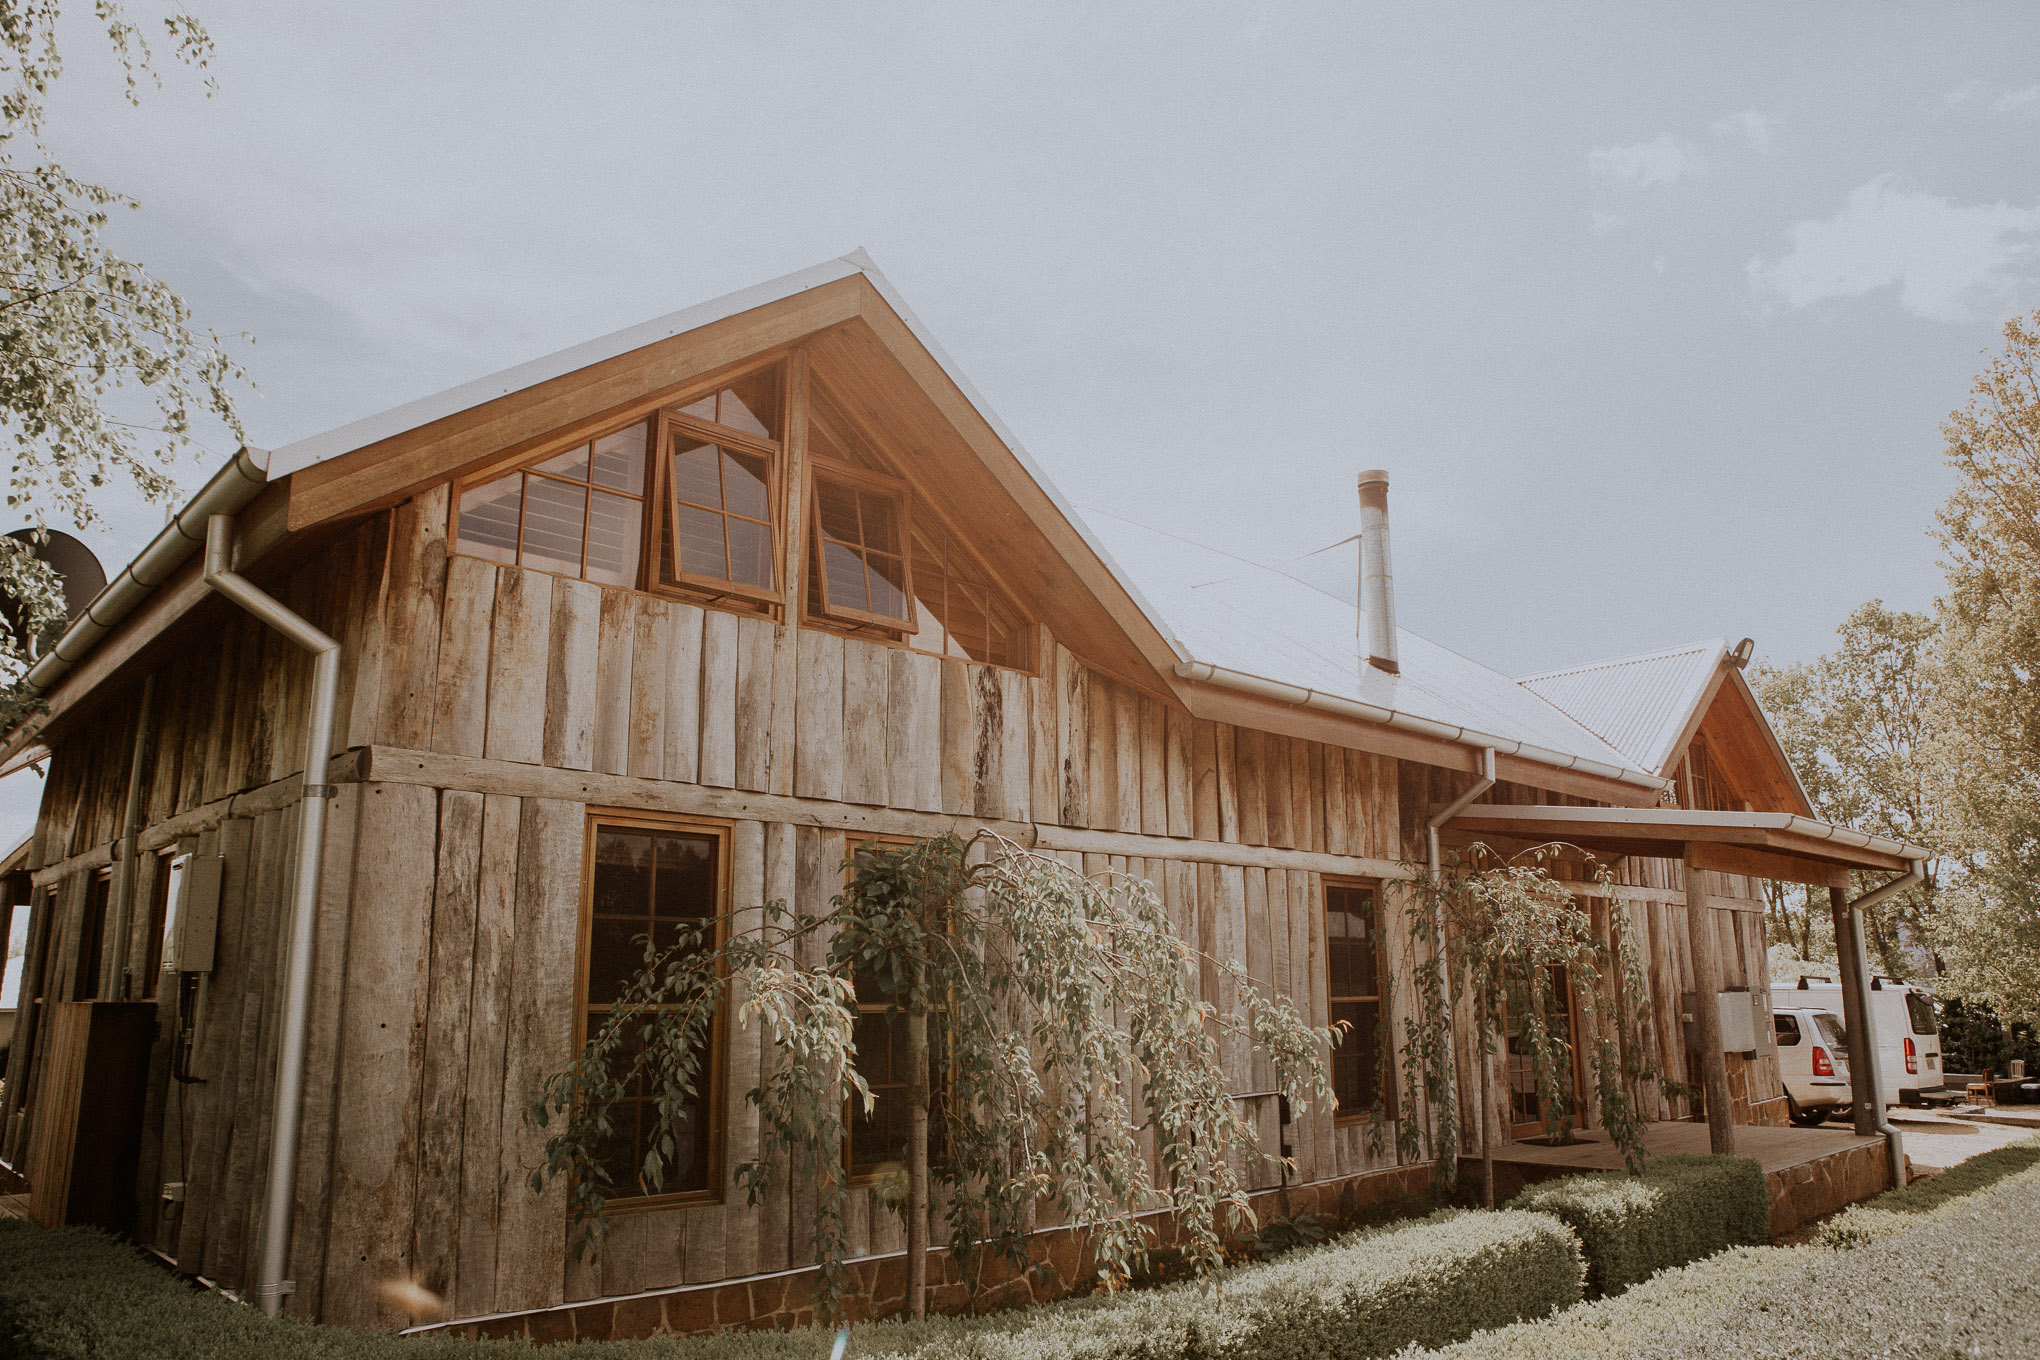 Emotional Rustic Blue Mountains wedding at Waldara Farm